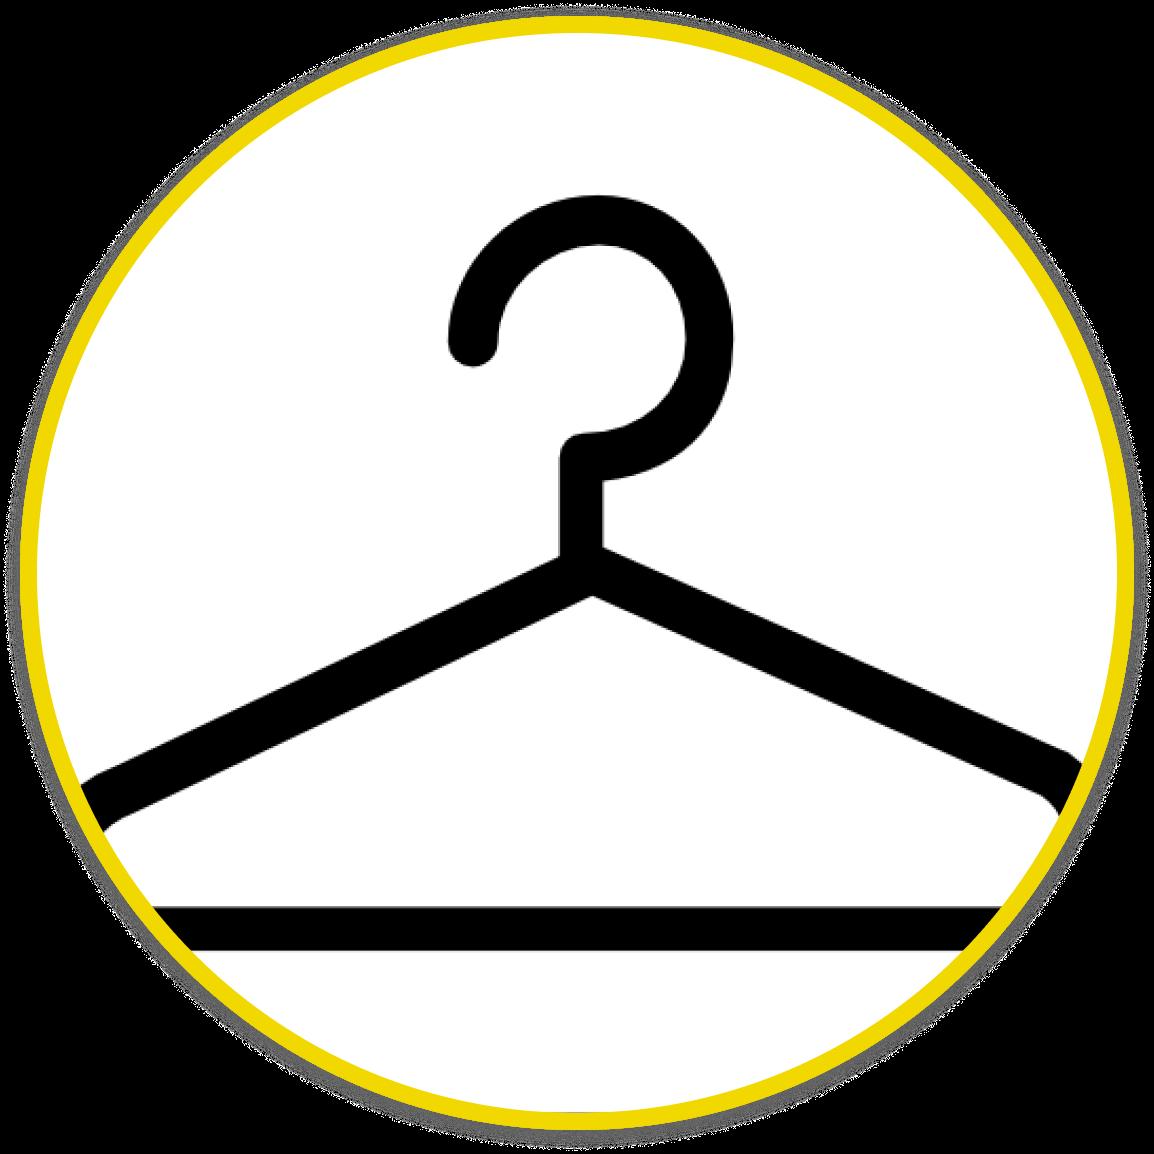 EasyTry logo